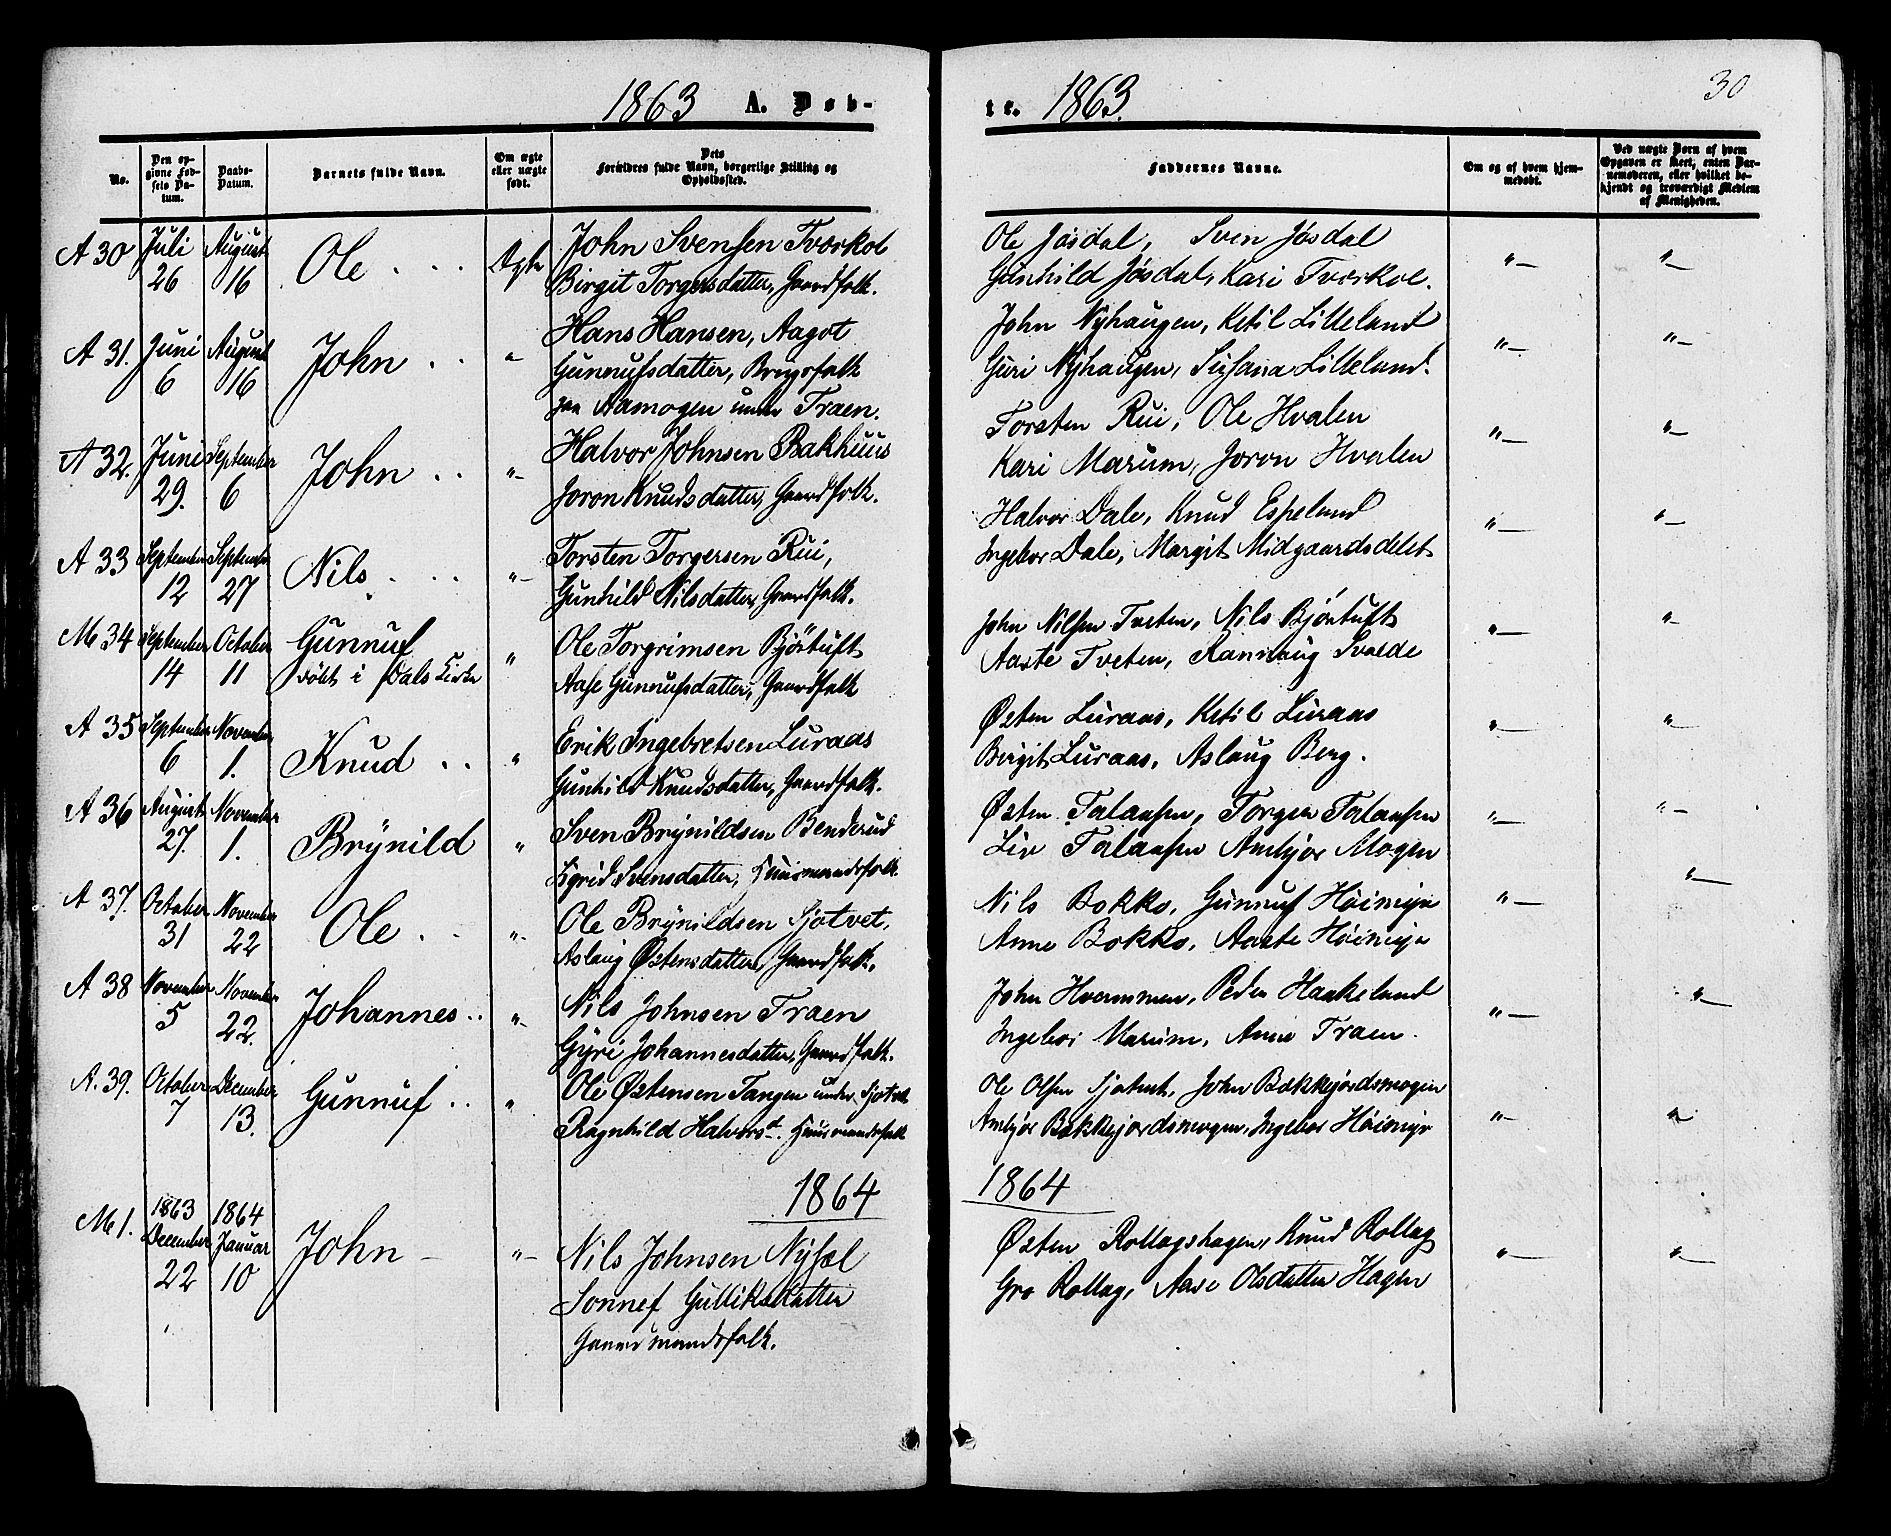 SAKO, Tinn kirkebøker, F/Fa/L0006: Ministerialbok nr. I 6, 1857-1878, s. 30